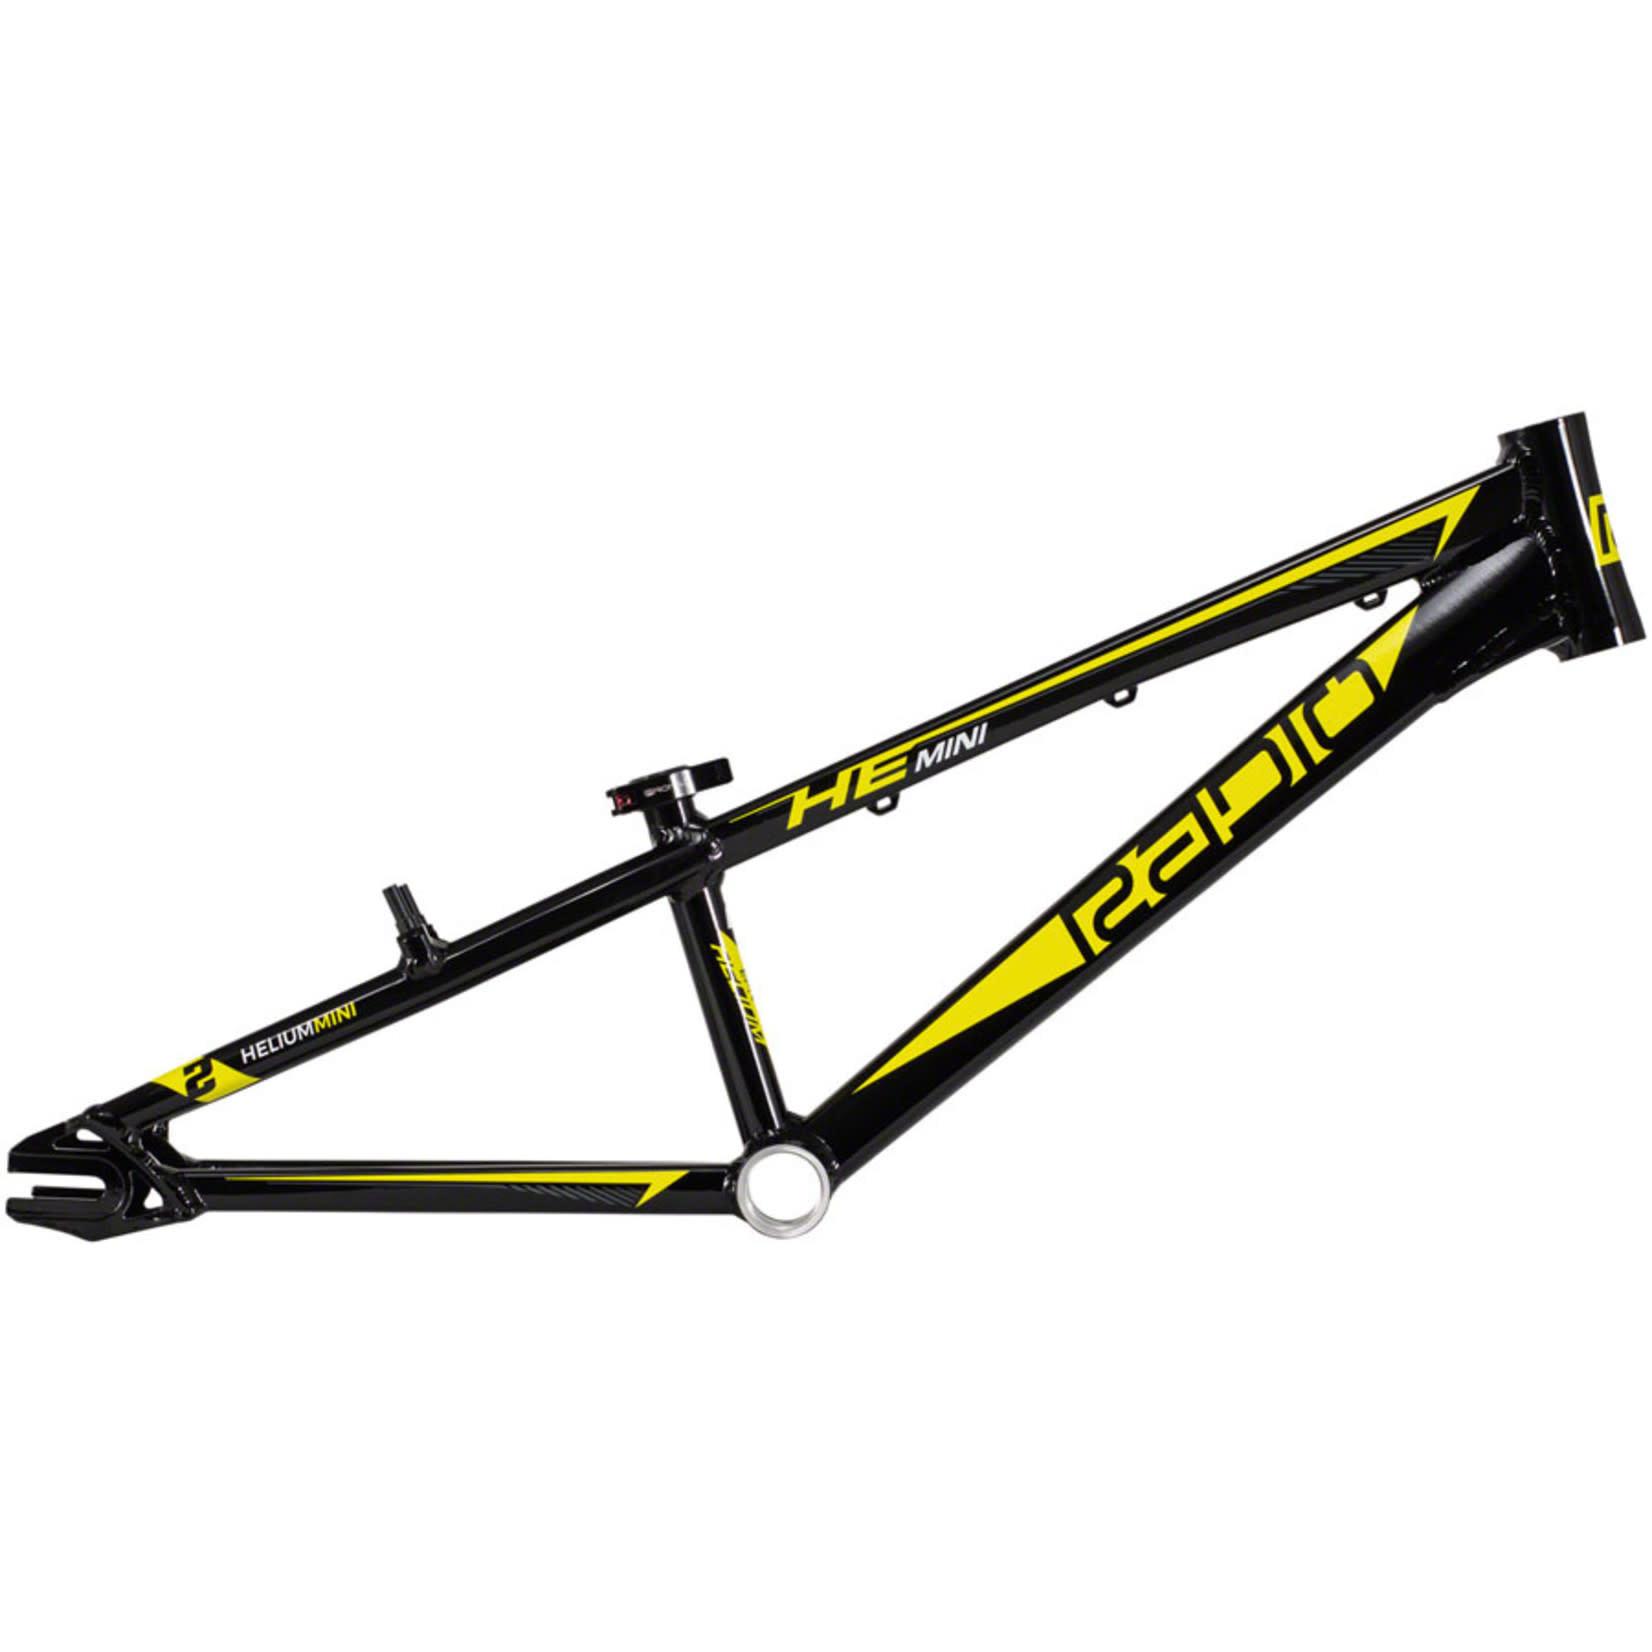 "Radio Radio Helium BMX Race Frame - Mini, 17.6"" TT, Black"